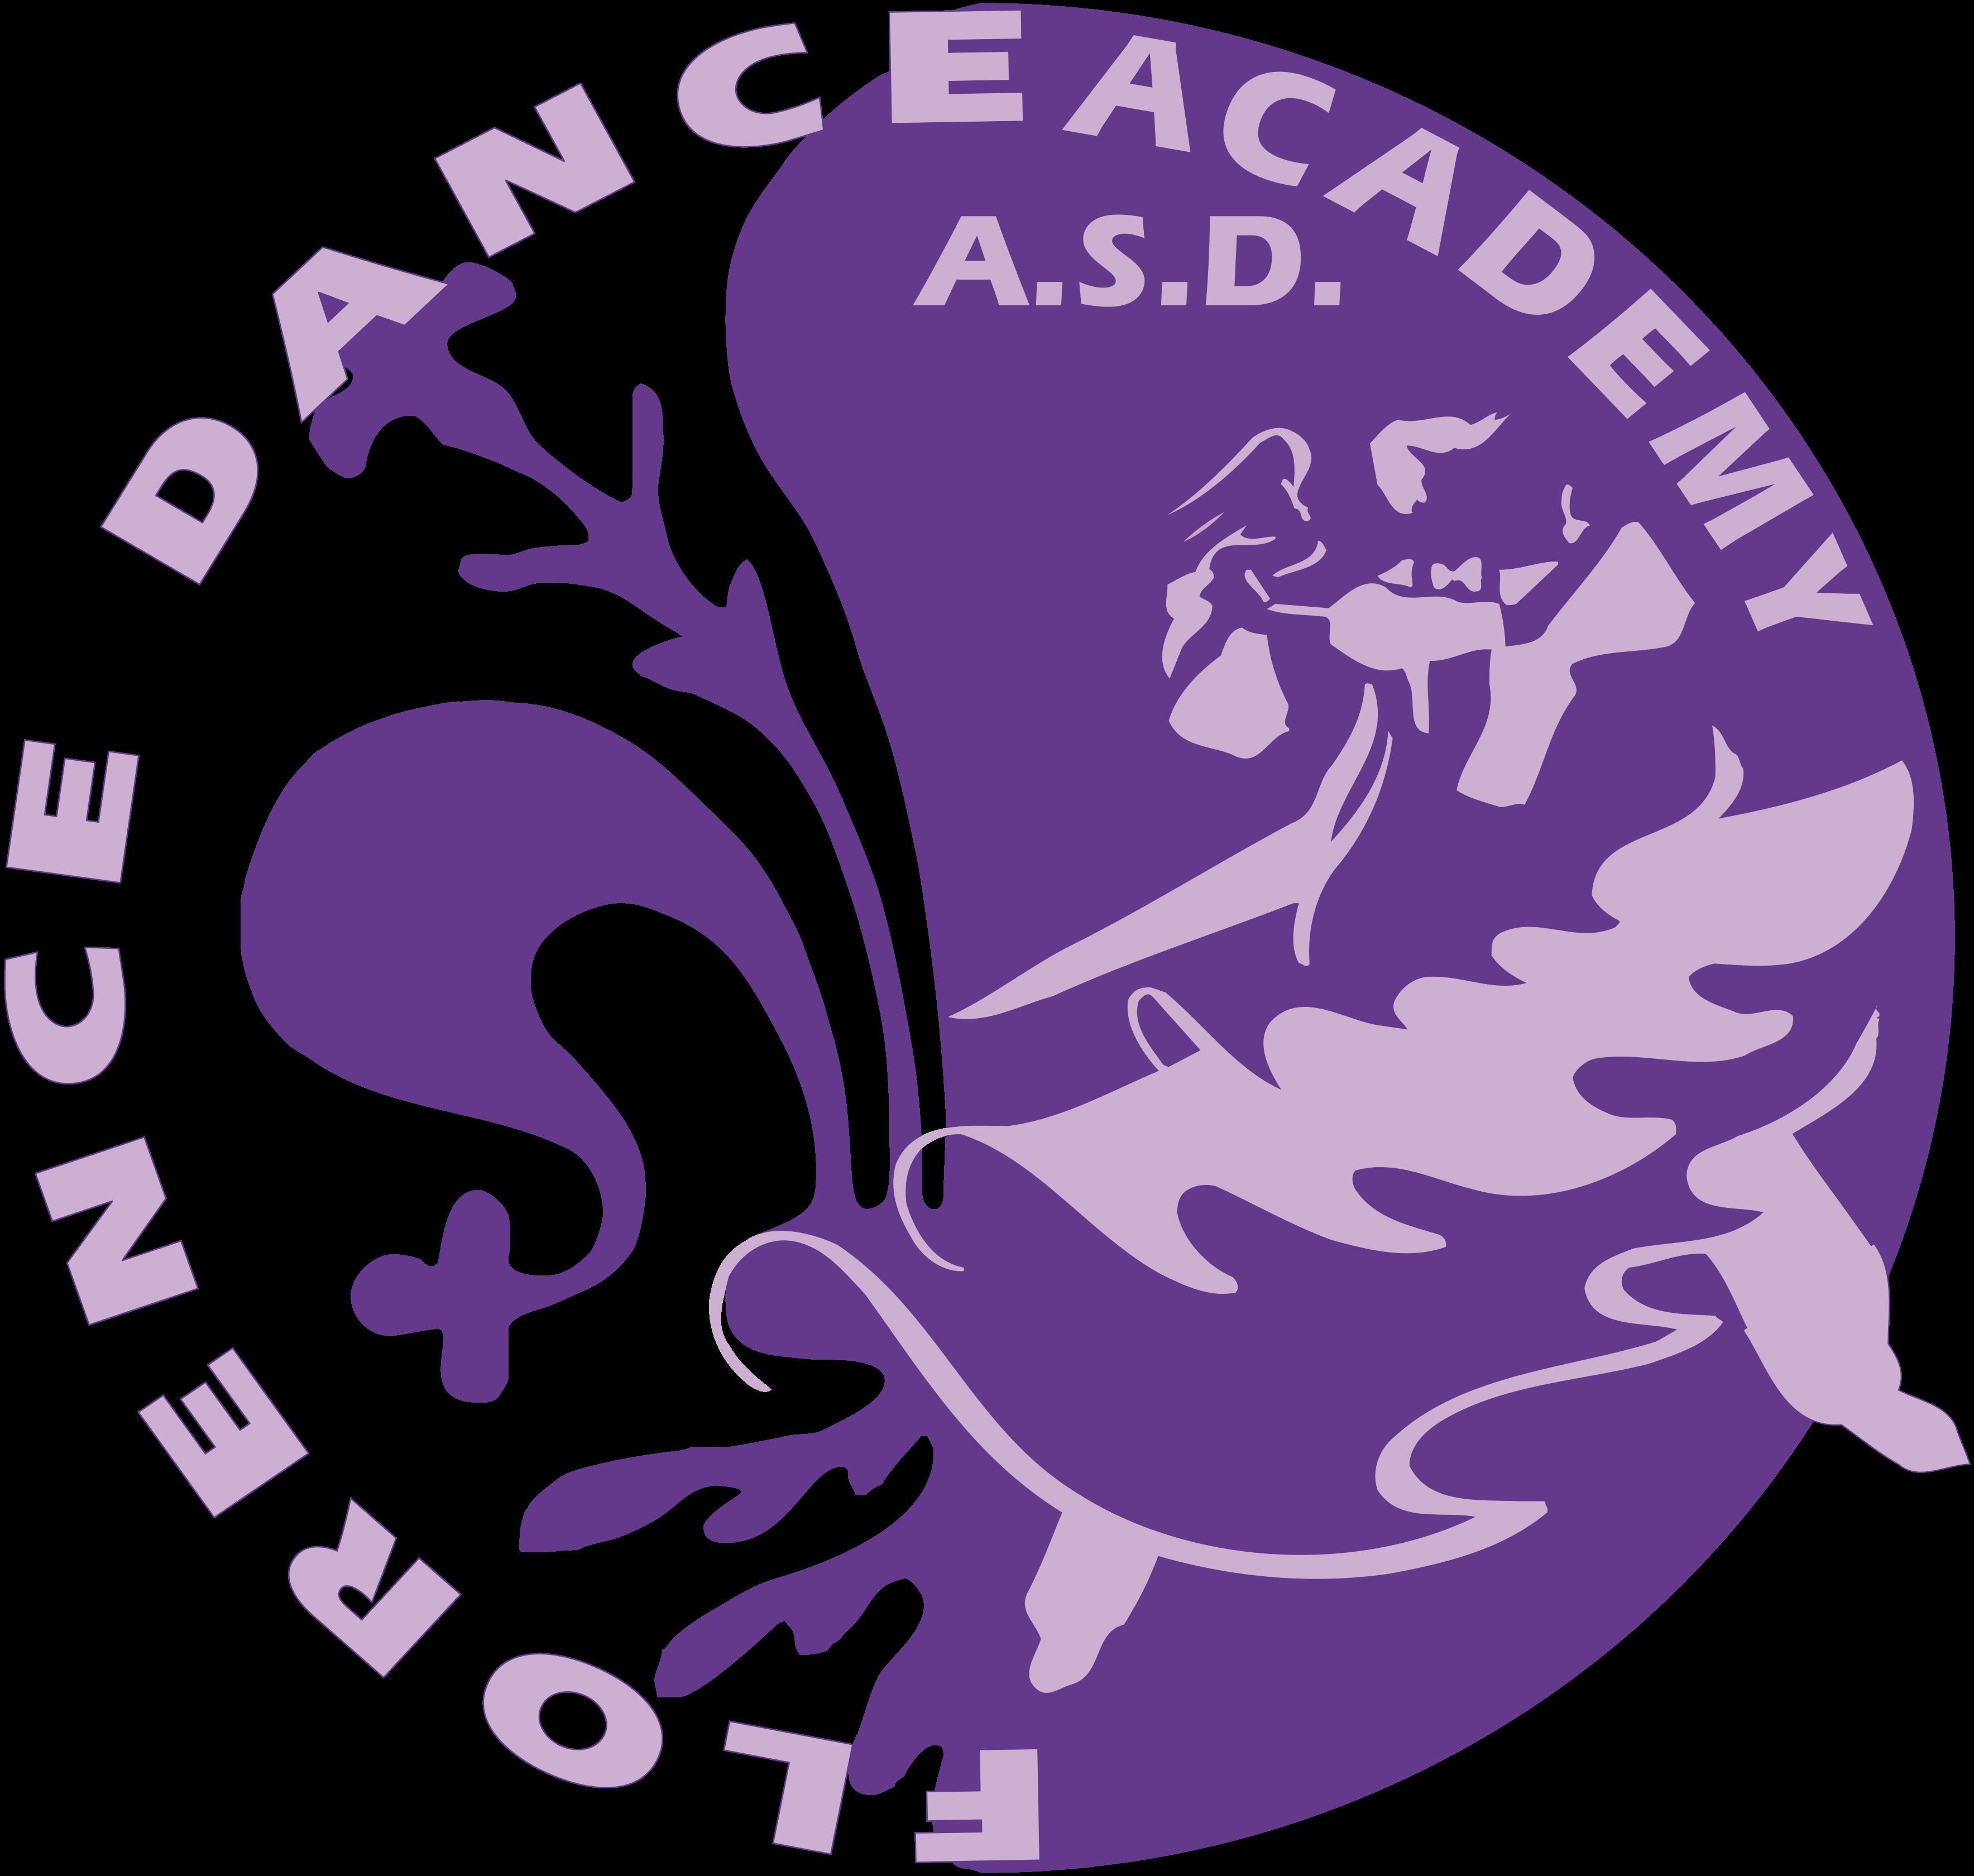 A.s.d. Florence Dance Academy